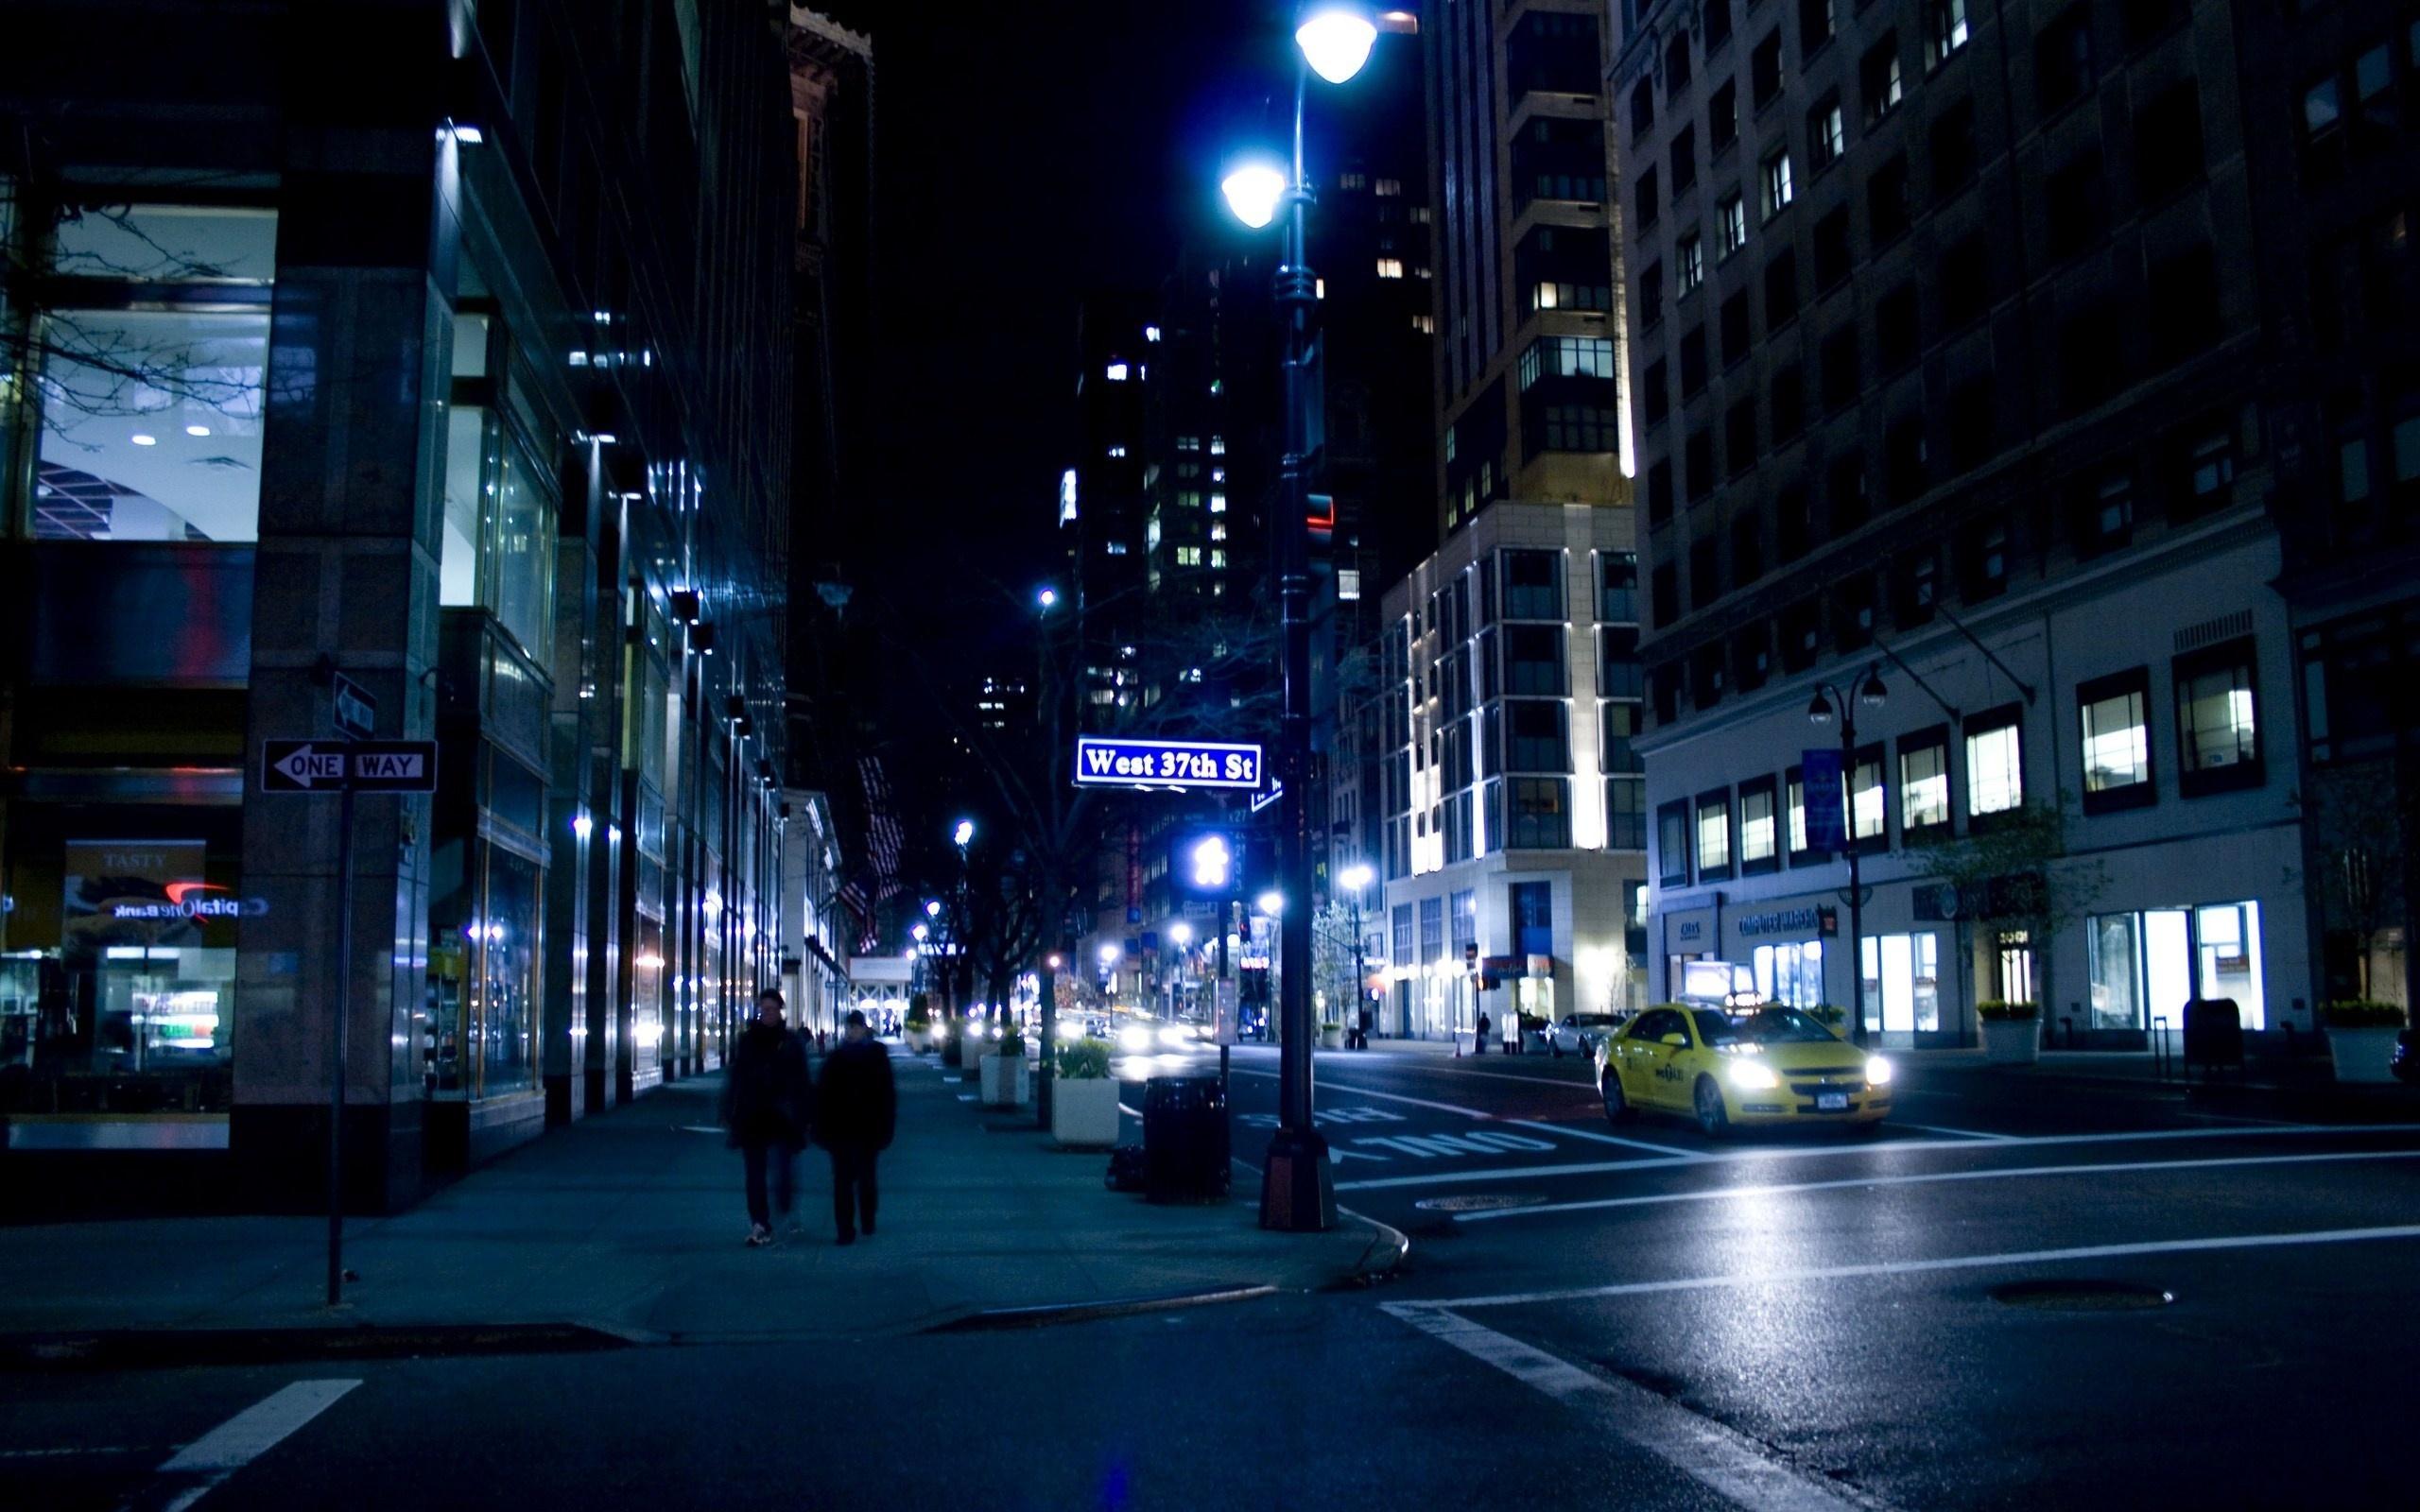 Hd wallpaper night - Theme Bin Blog Archive New York Night Hd Wallpaper